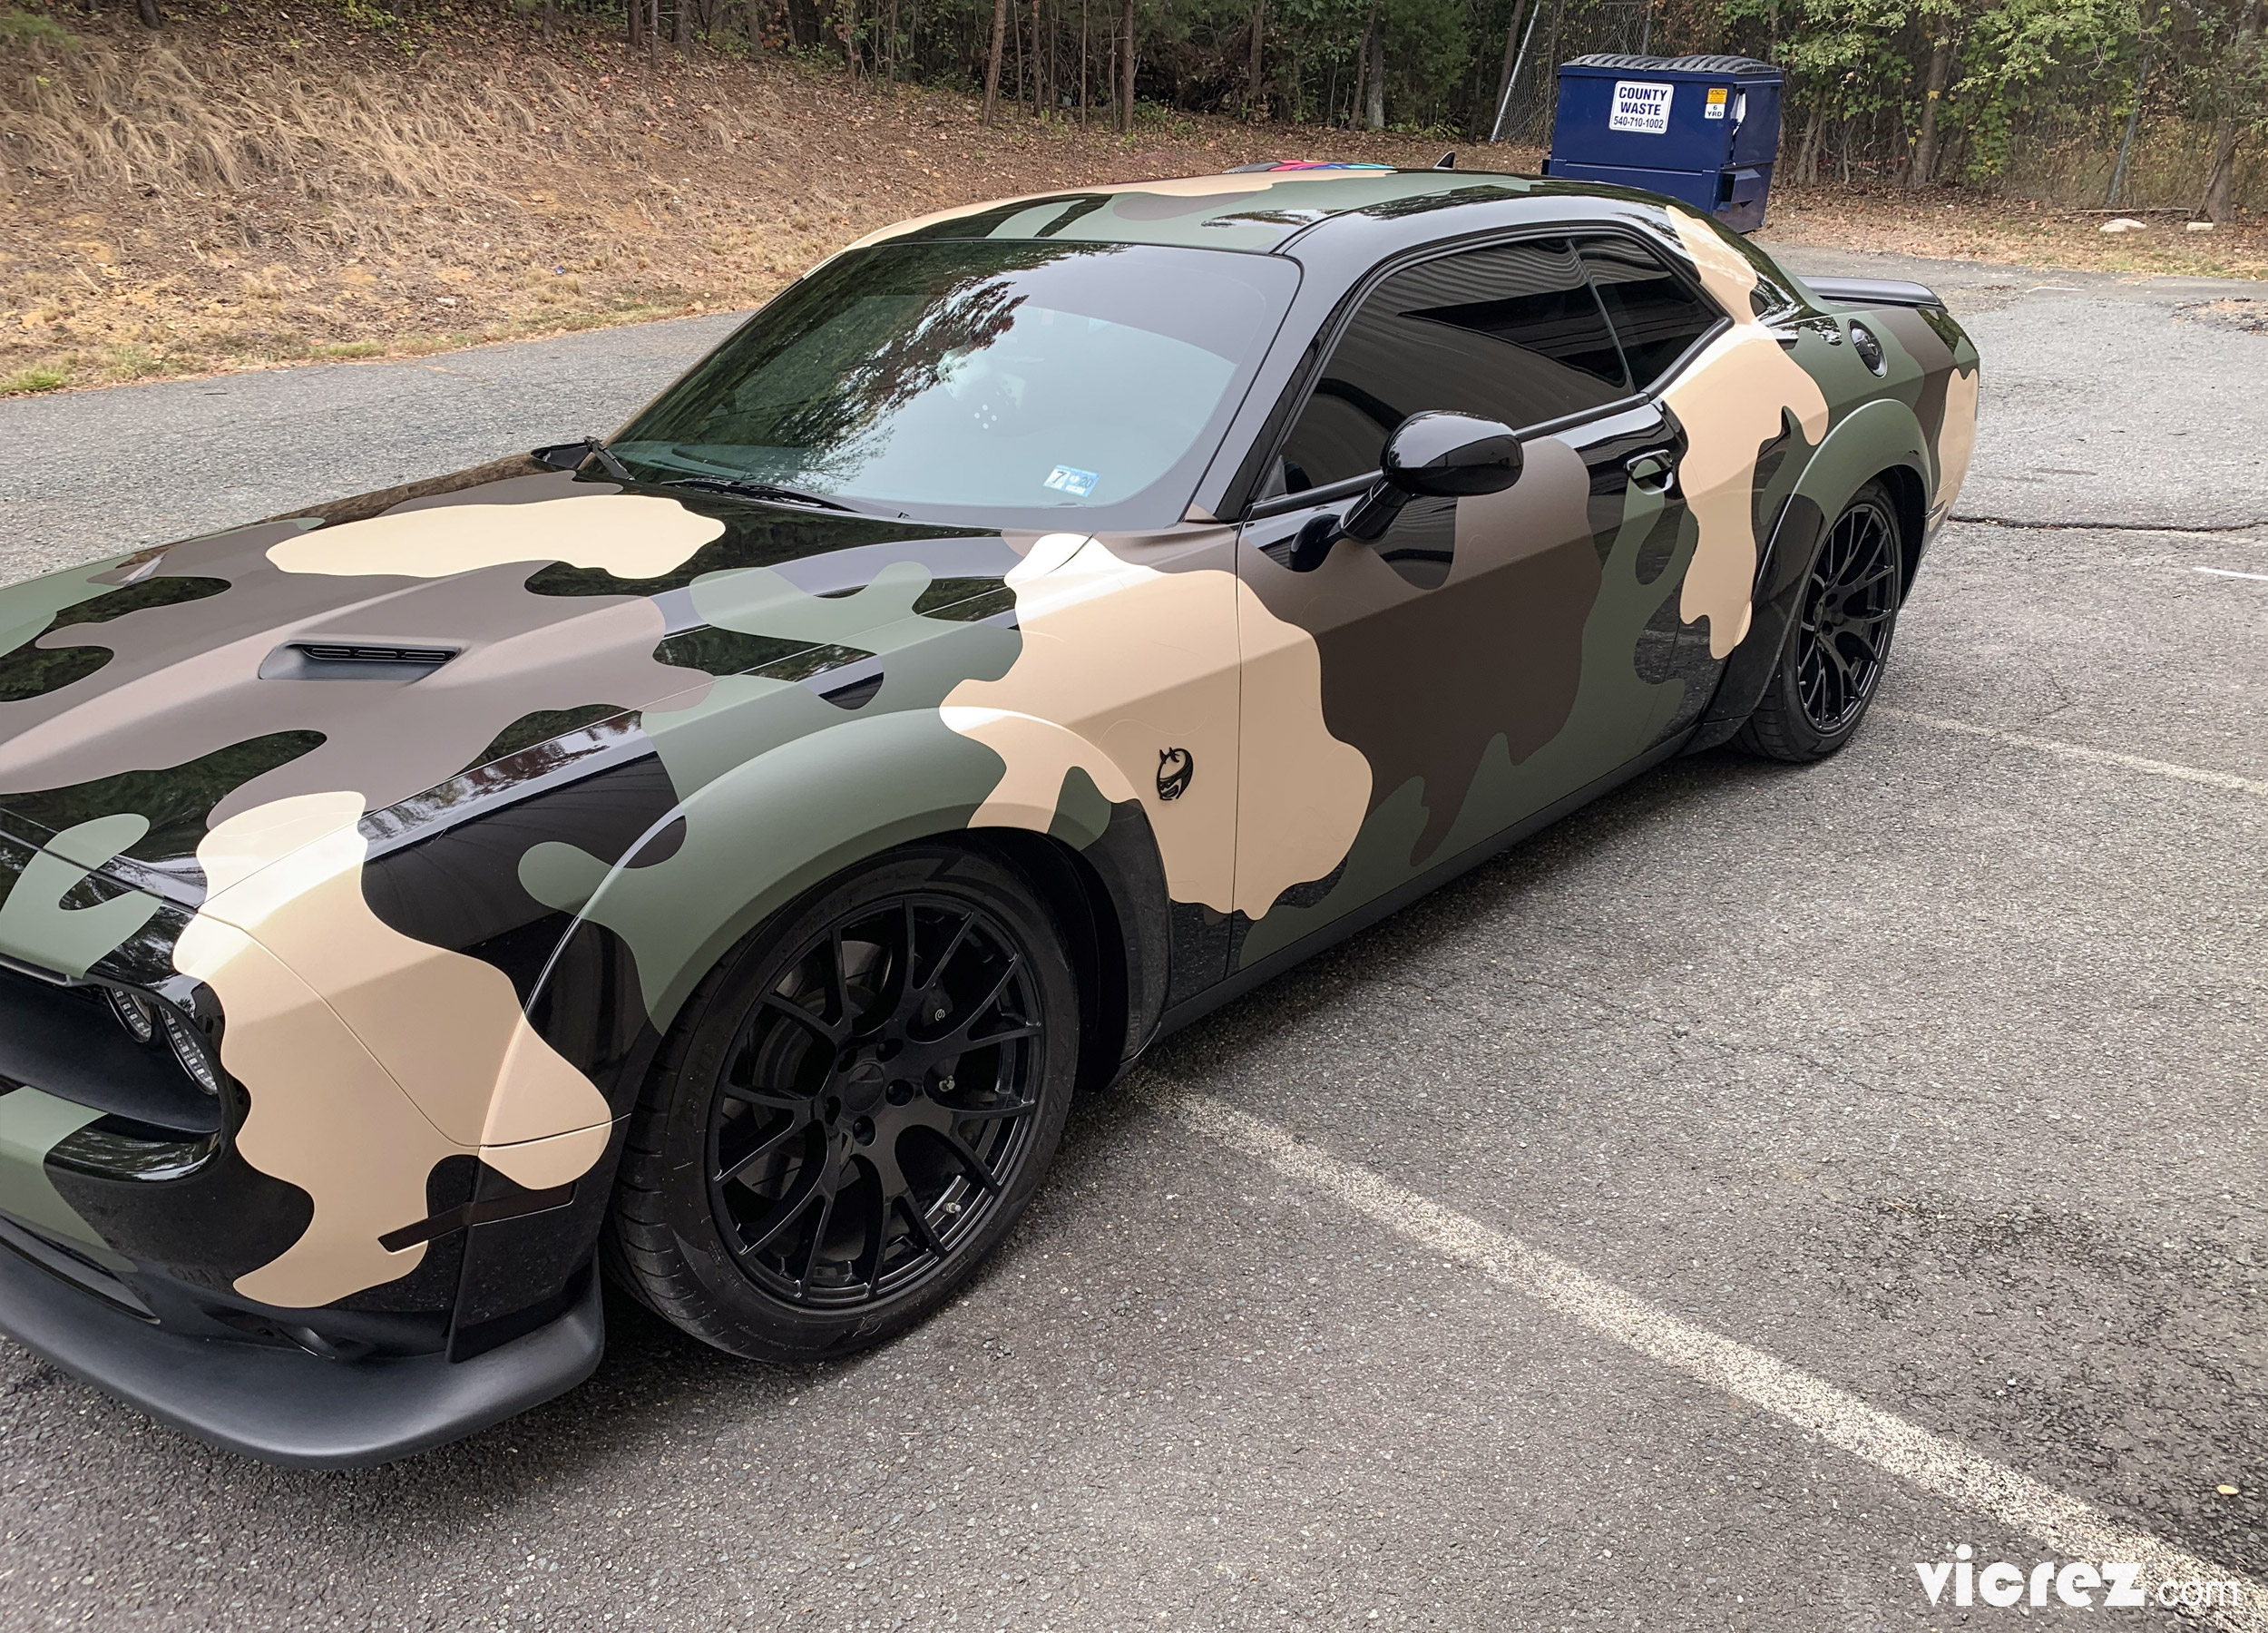 Camouflage Dodge Challenger x Vicrez Wide Body Fender Flares vz101488